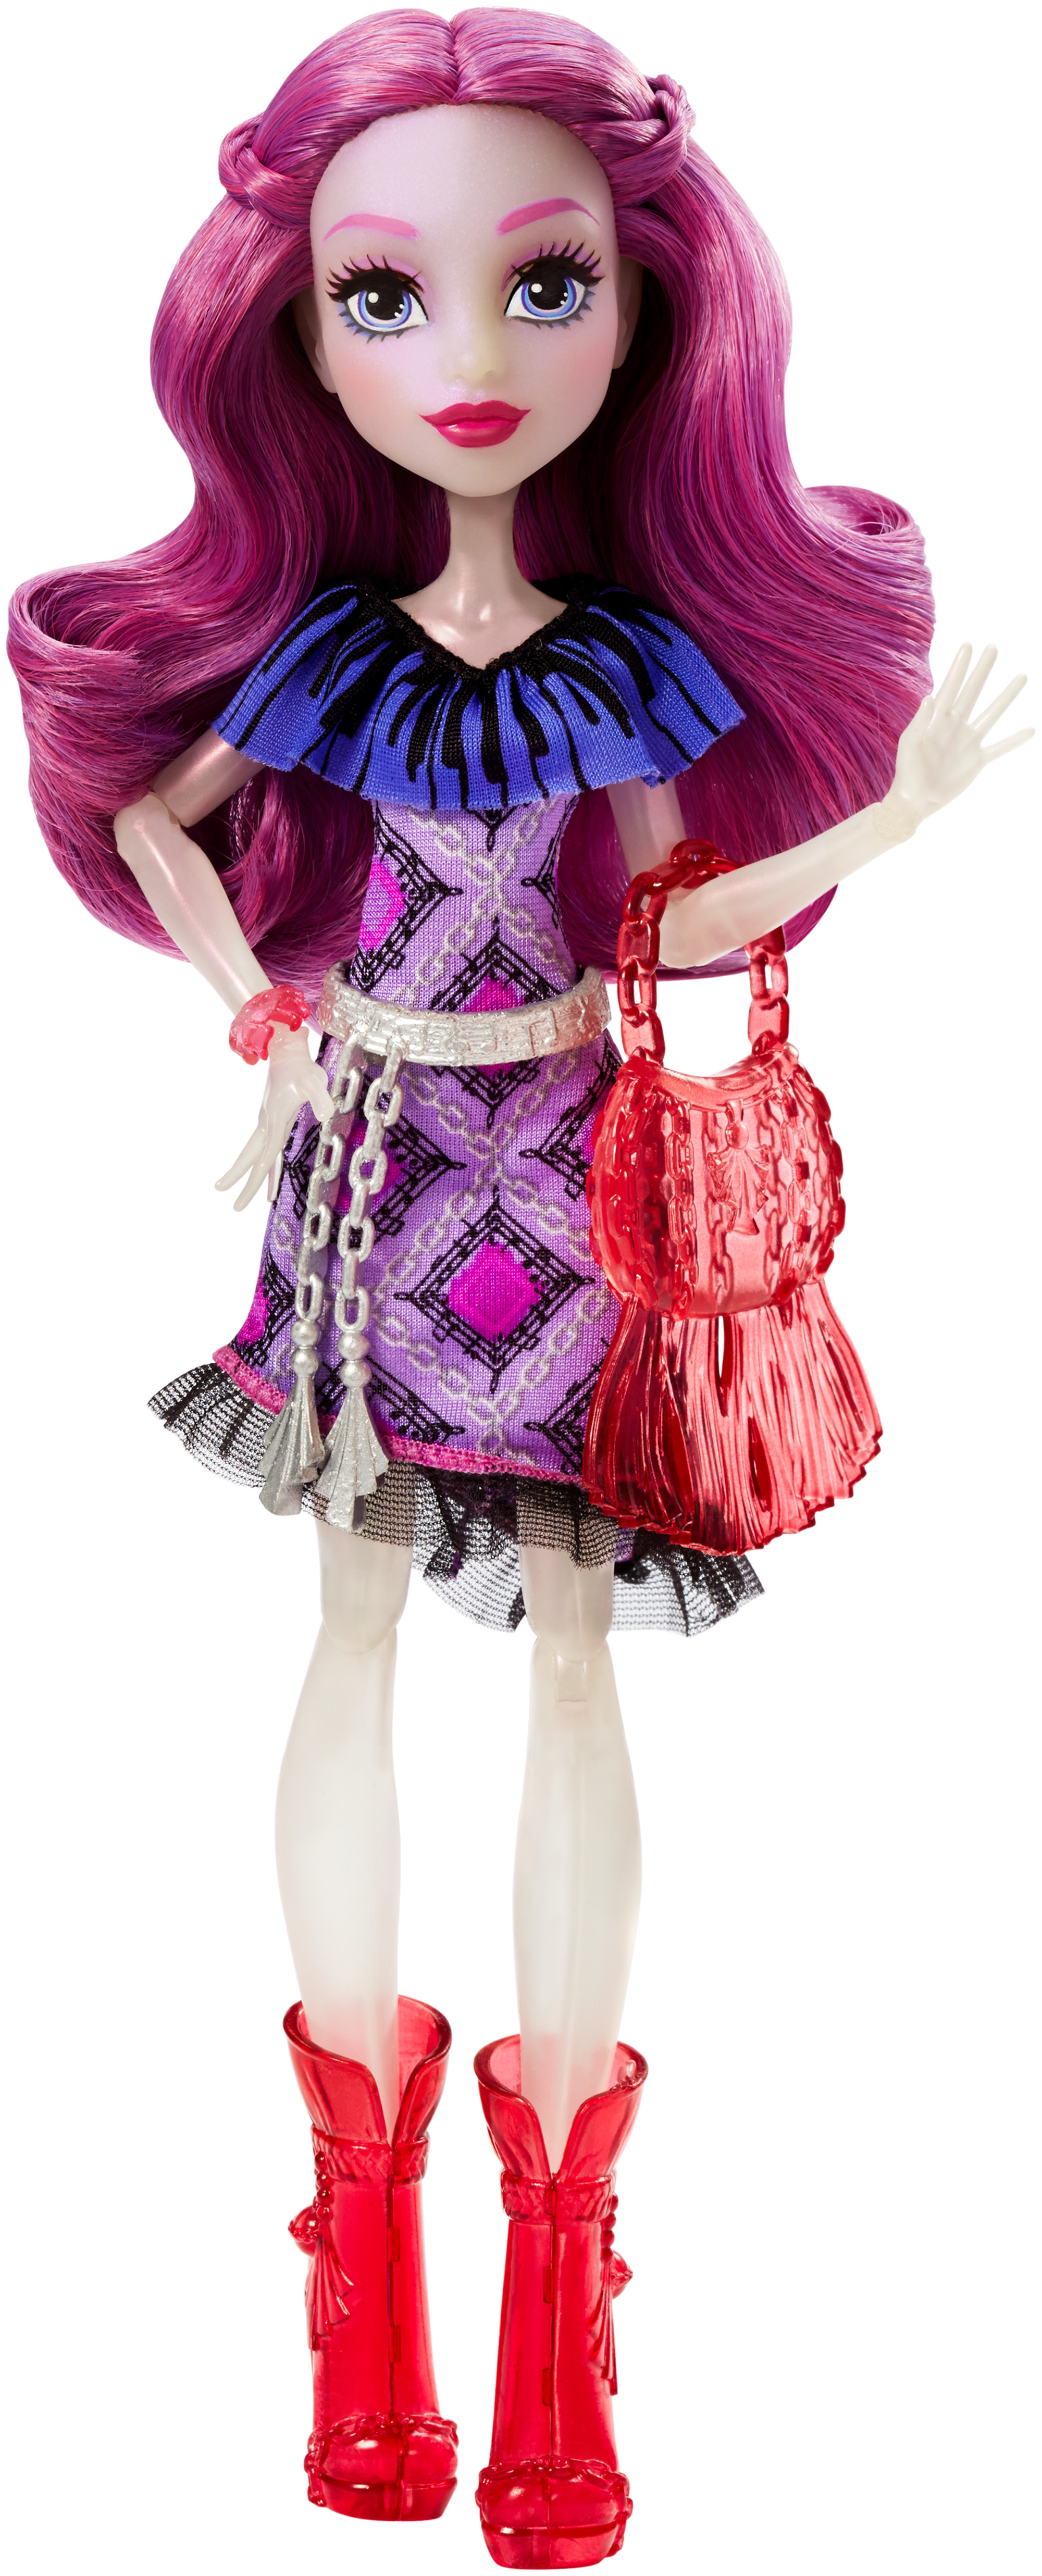 Monster High Ari Hauntington Doll by MATTEL INC.